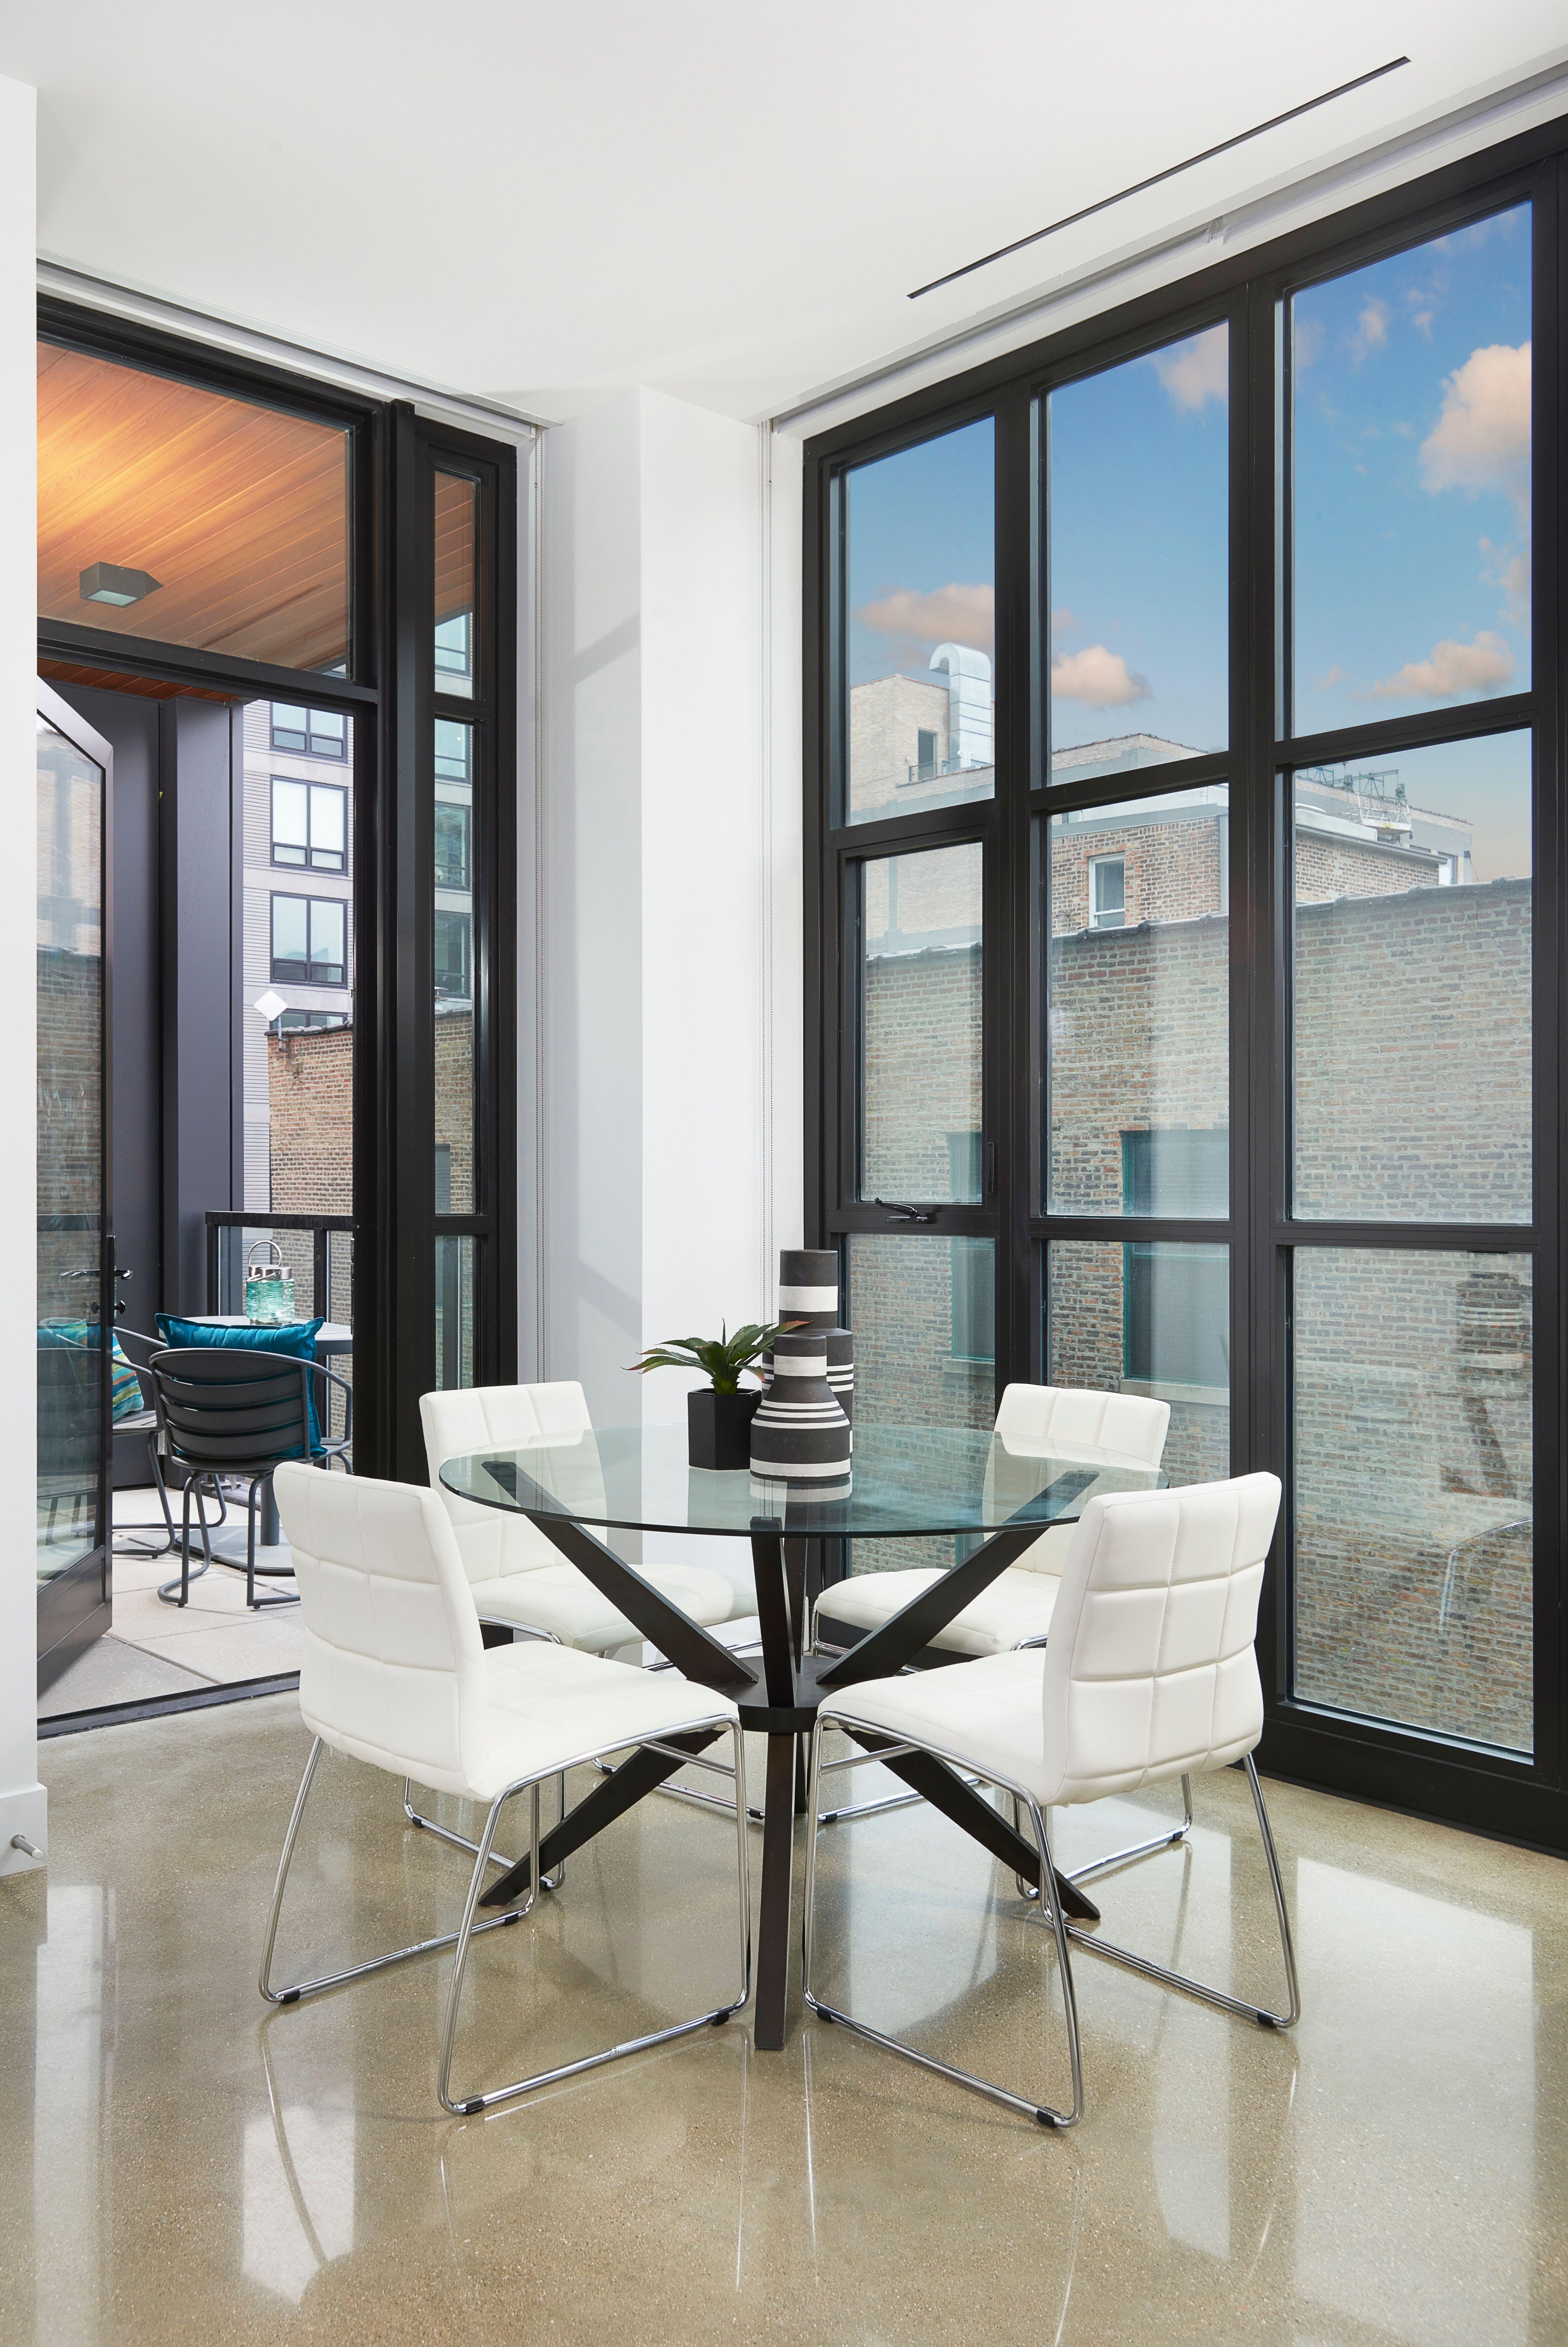 #diningroom #diningroomdecor #glassdiningtable #homedecor